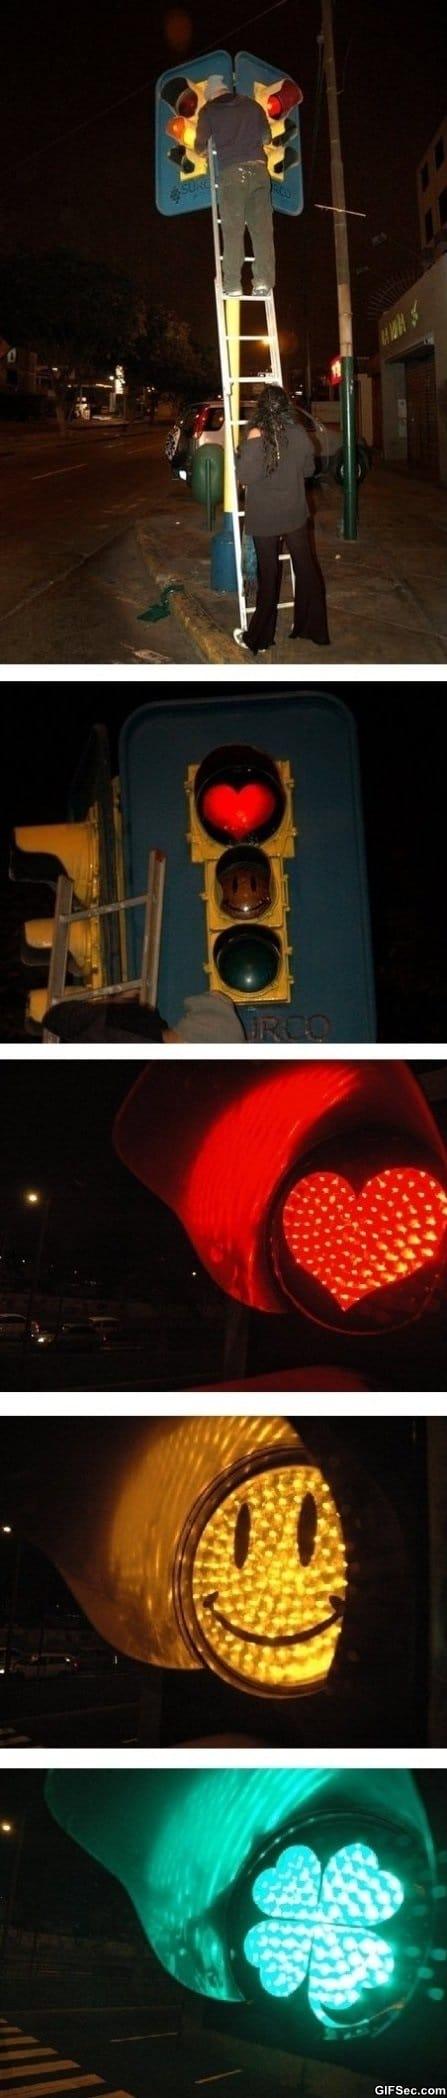 traffic-lights-go-crazy